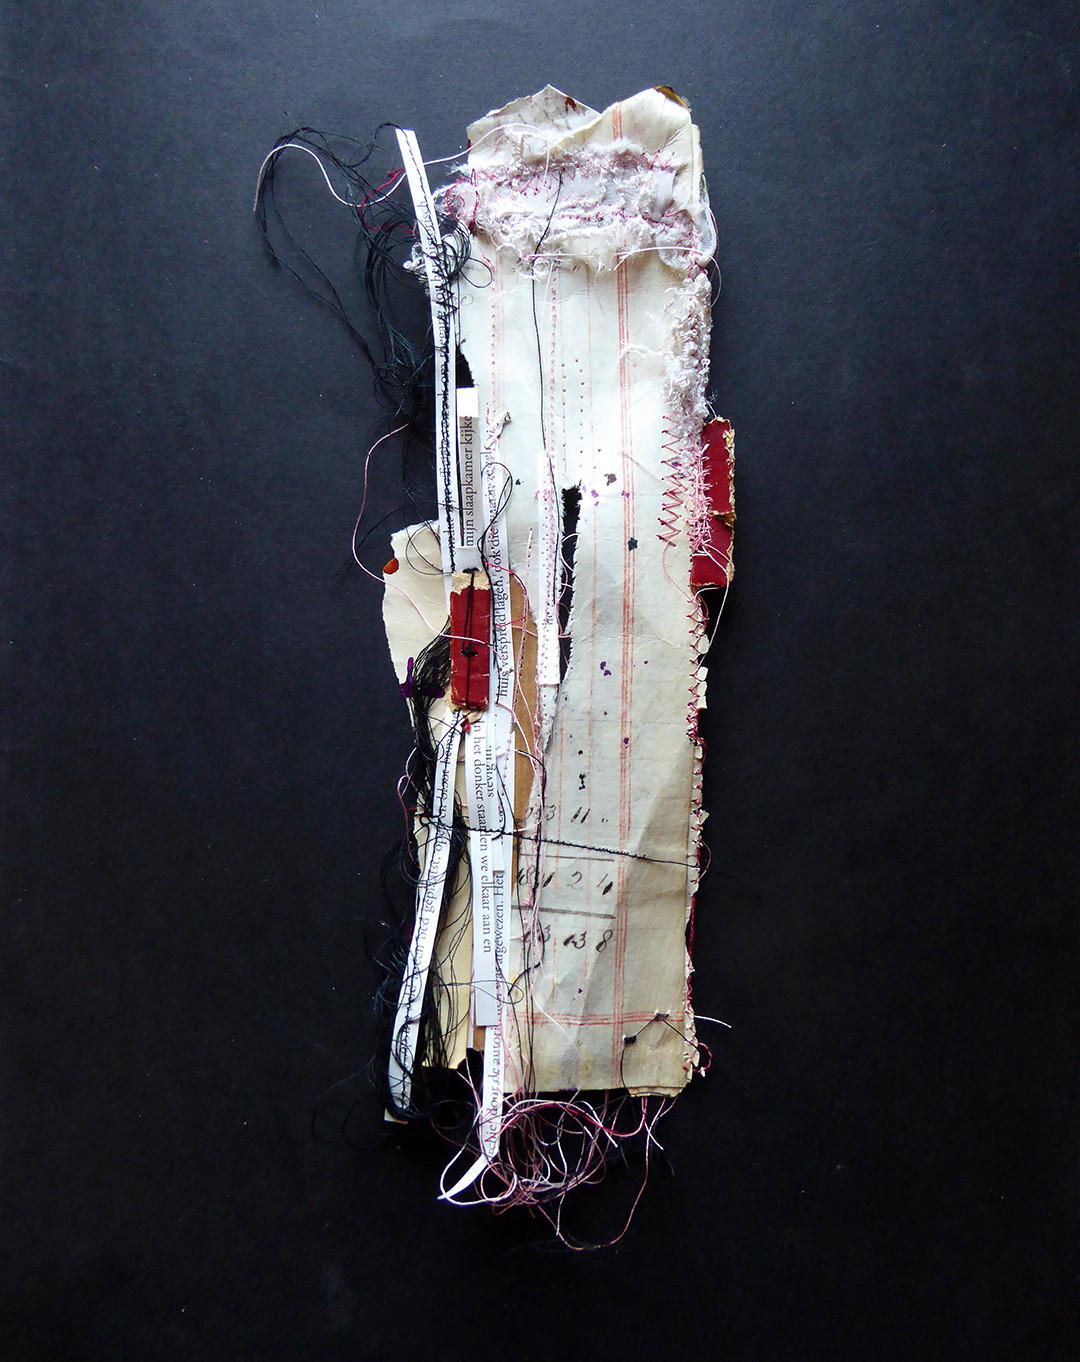 Just Yvette Contemporary Expressive Art - My Art